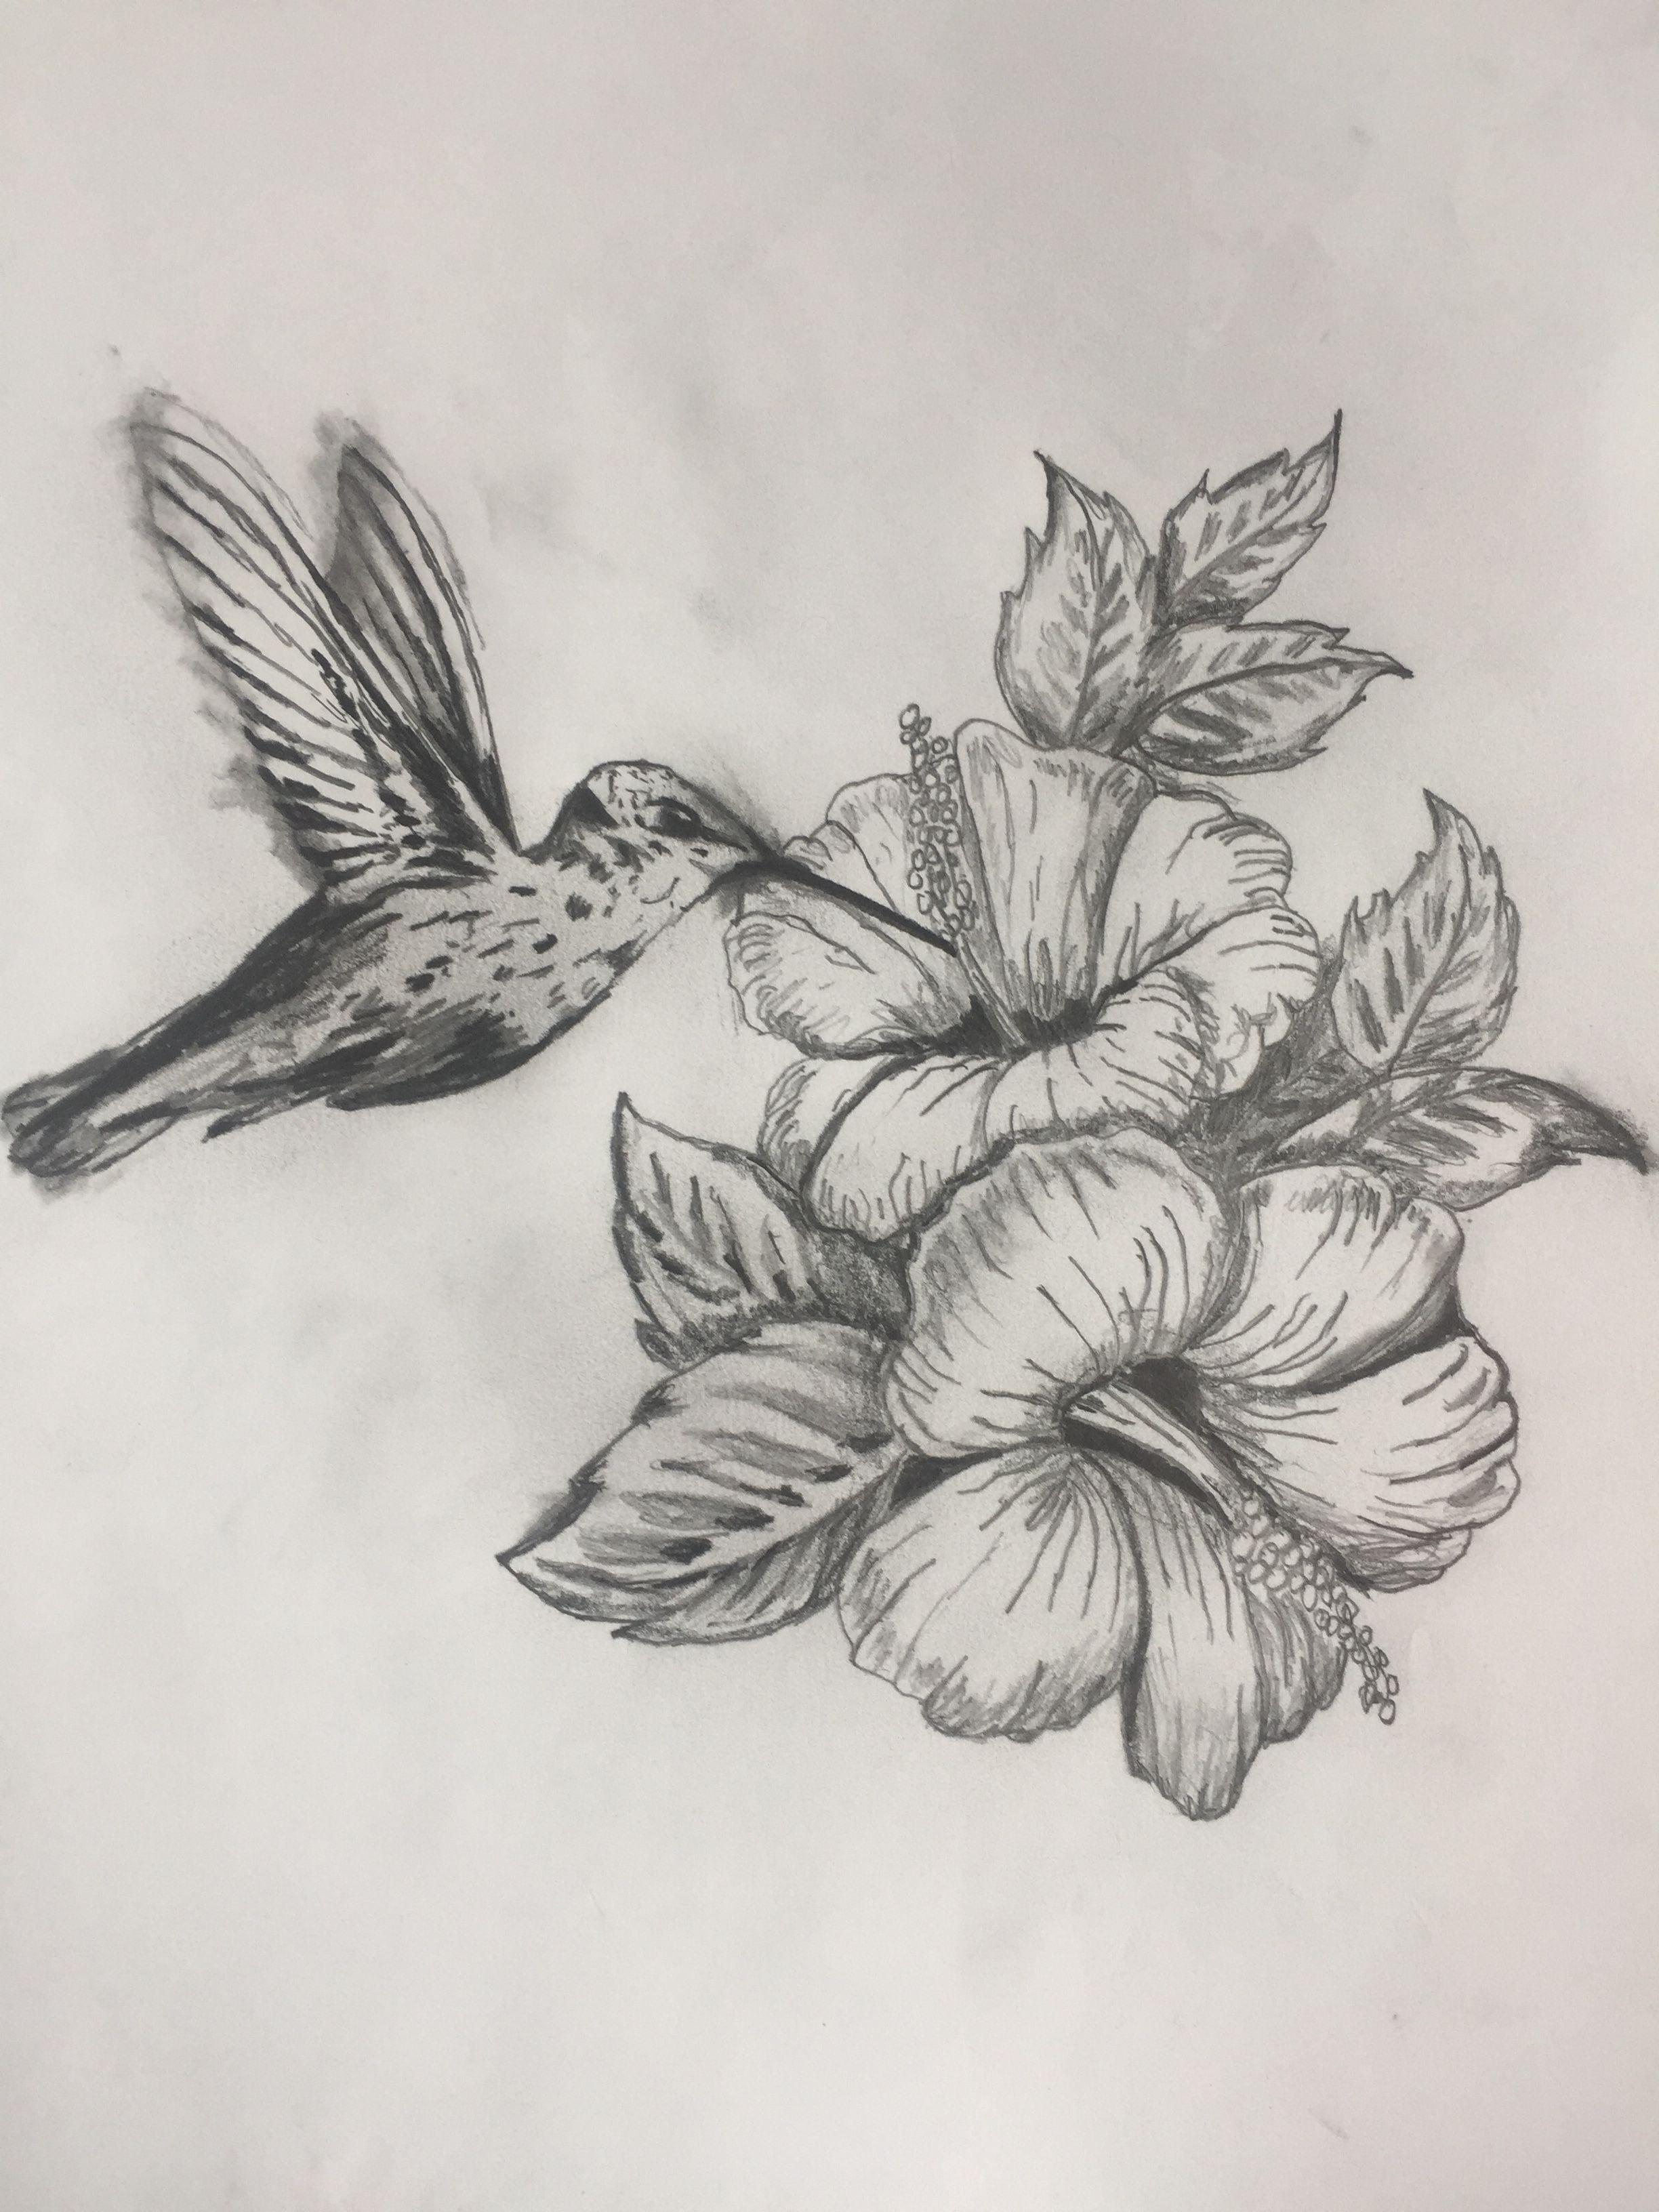 Drawing For Tattoo To Honor My Mom Hummingbird Hibiscus Flower Tattoo Shoulder Hummingbird Tattoo Hummingbird Flower Tattoos